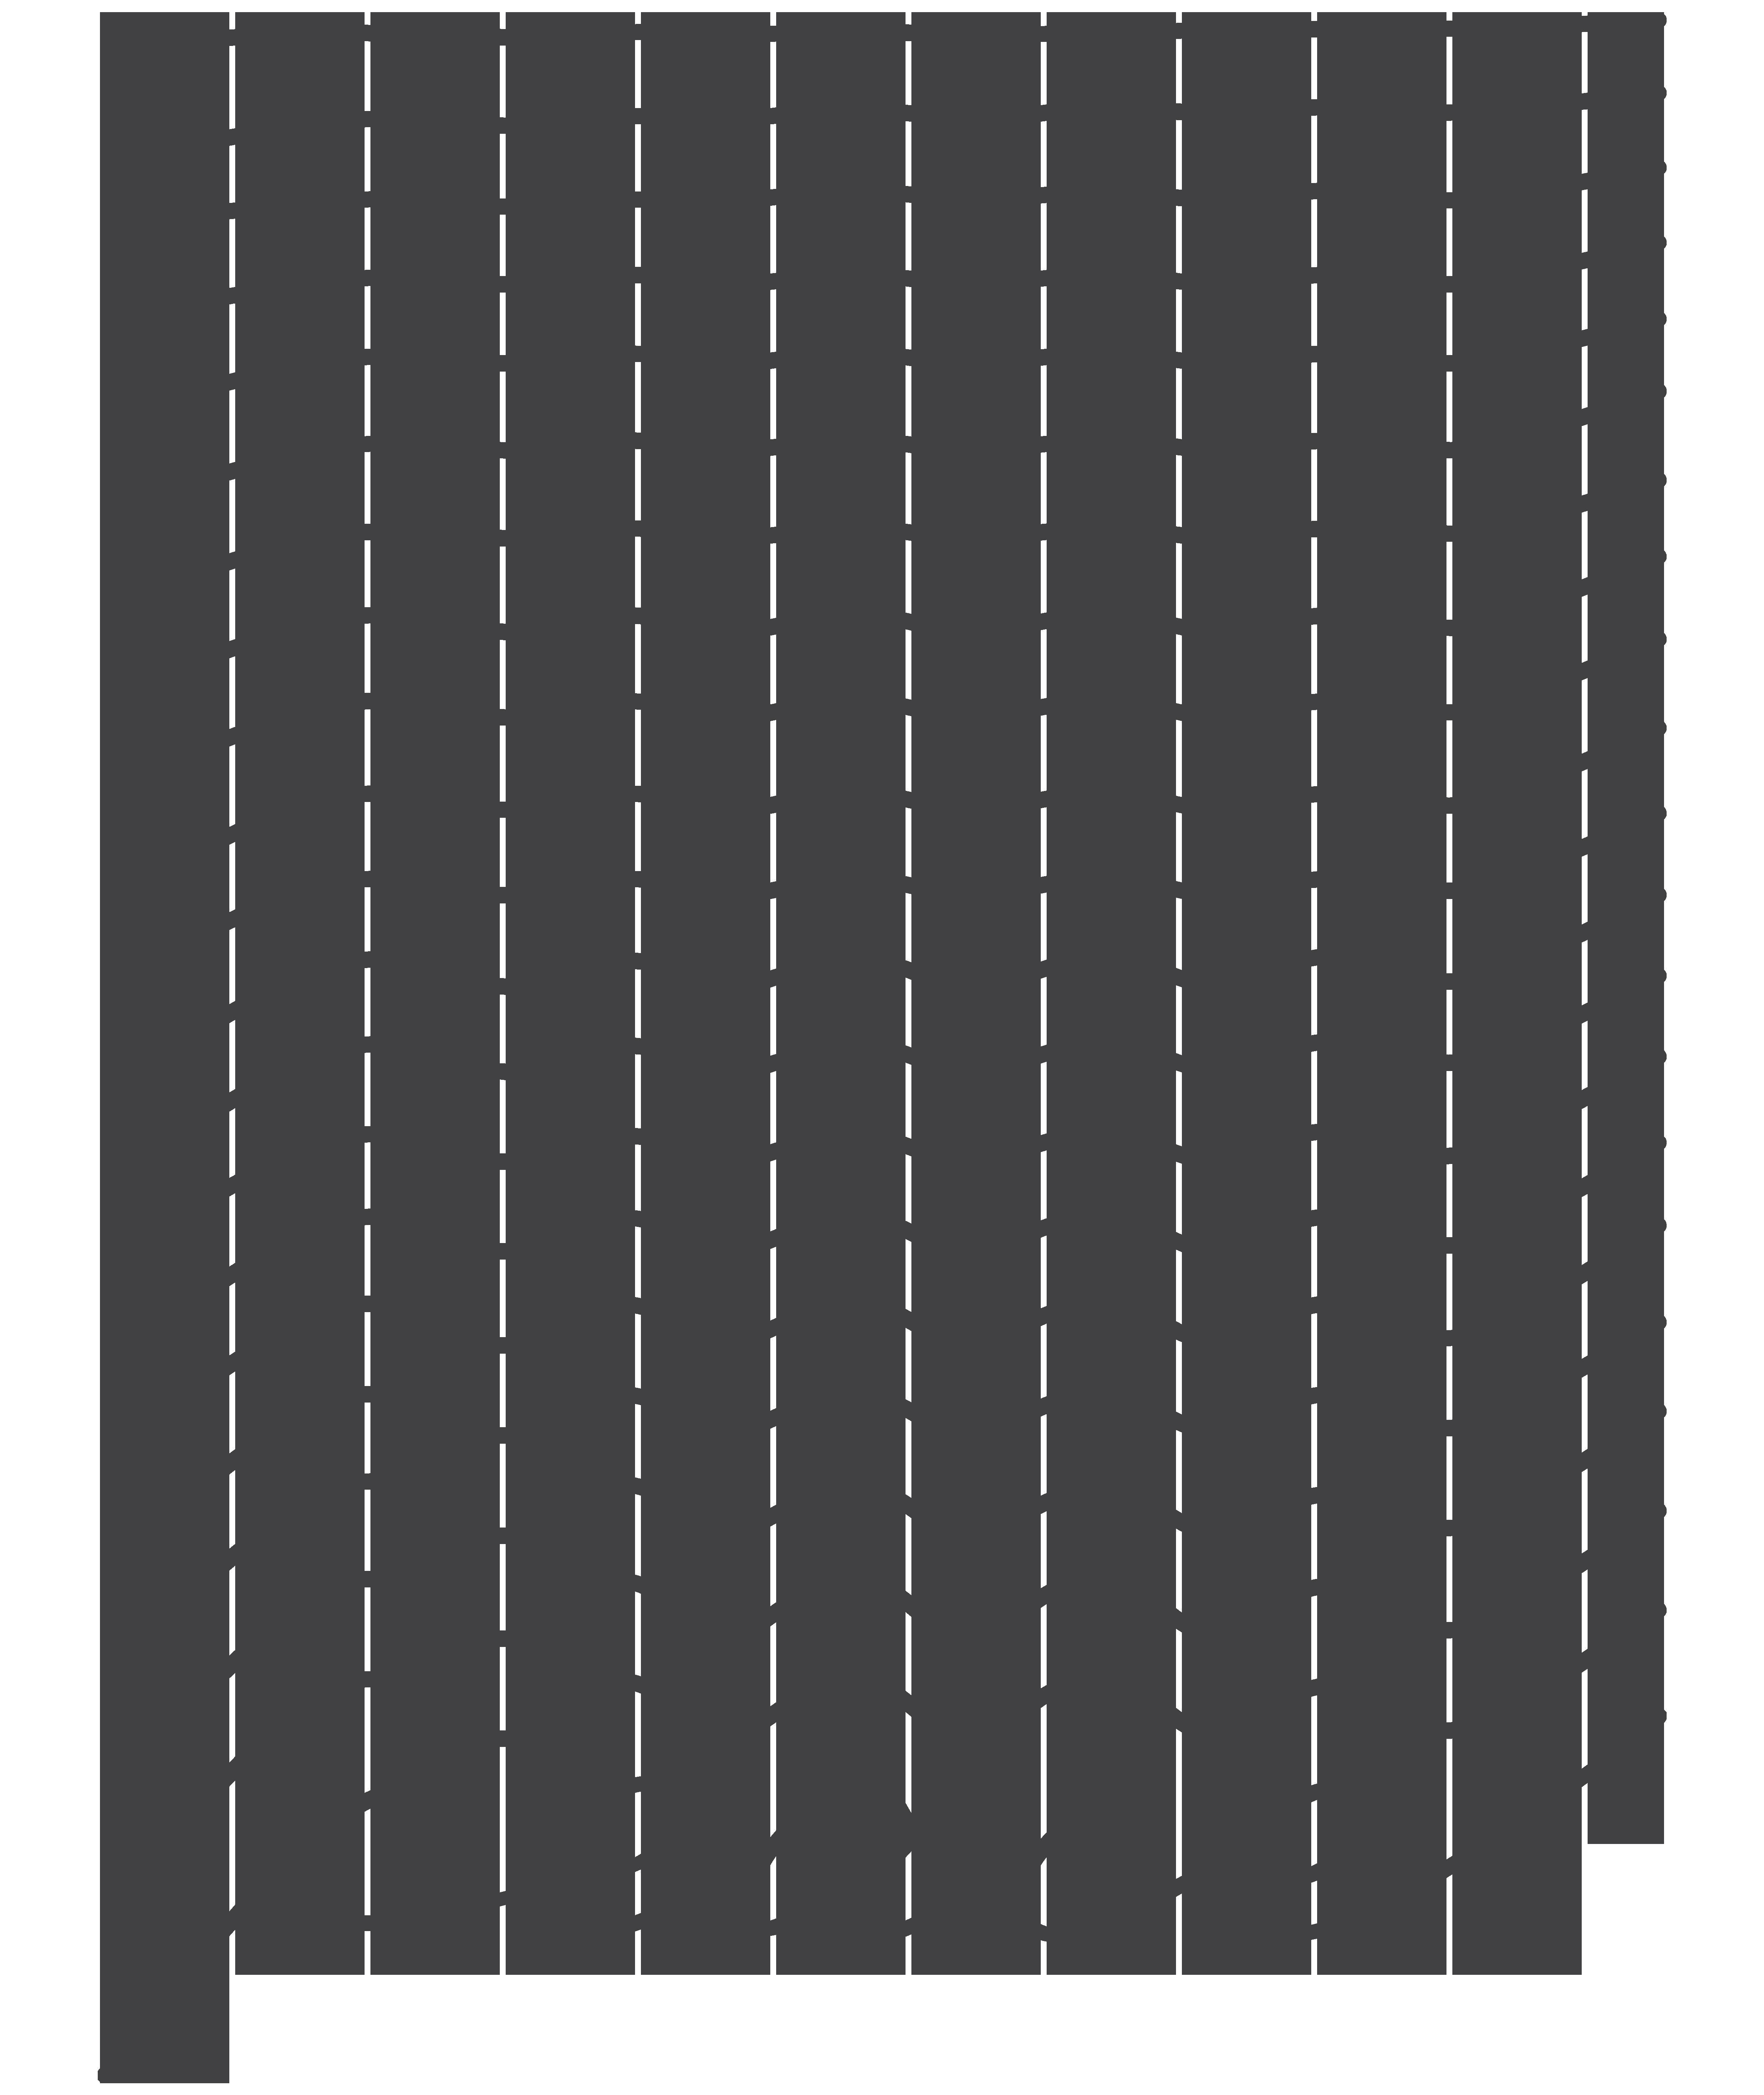 Peace Tshirt Design